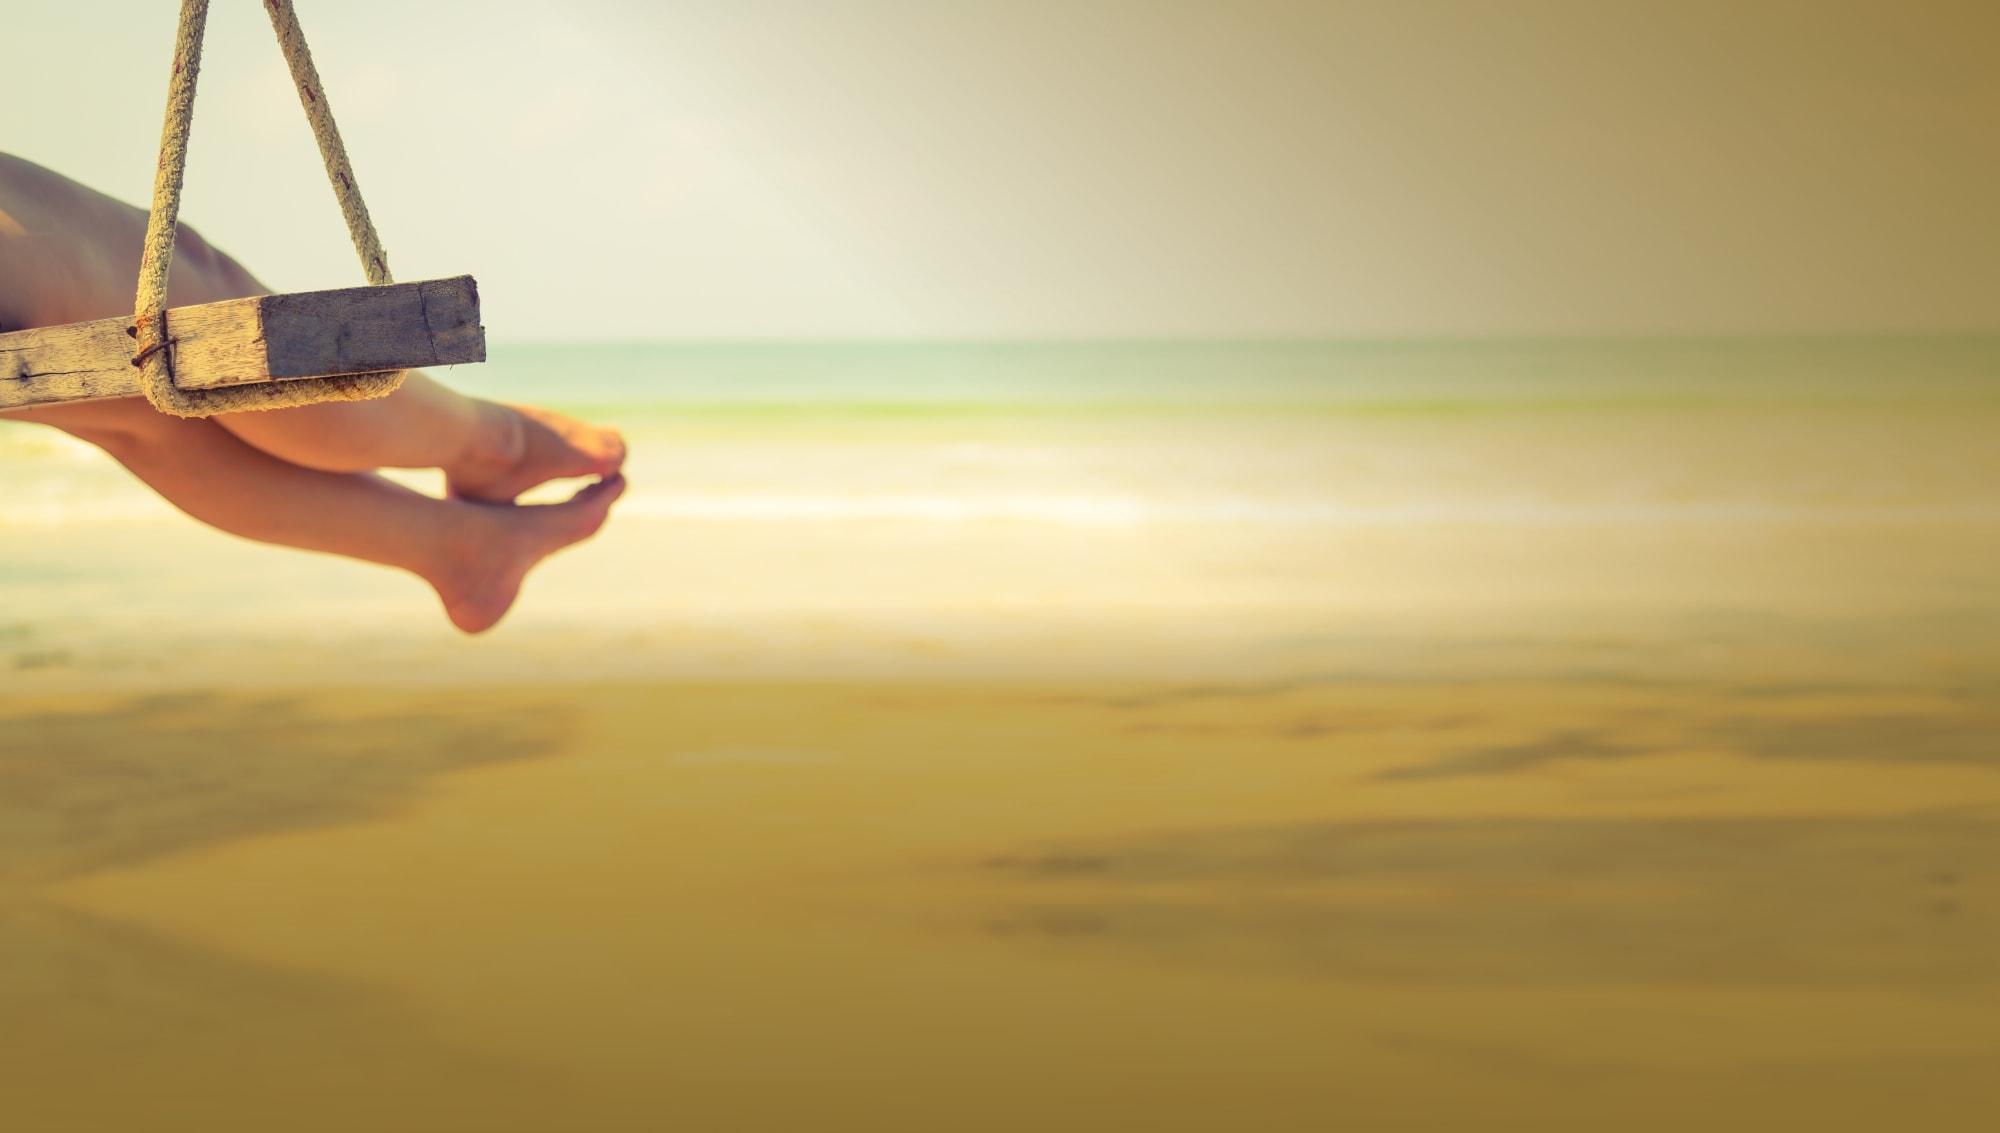 Orthopedic, legs, sand, swings